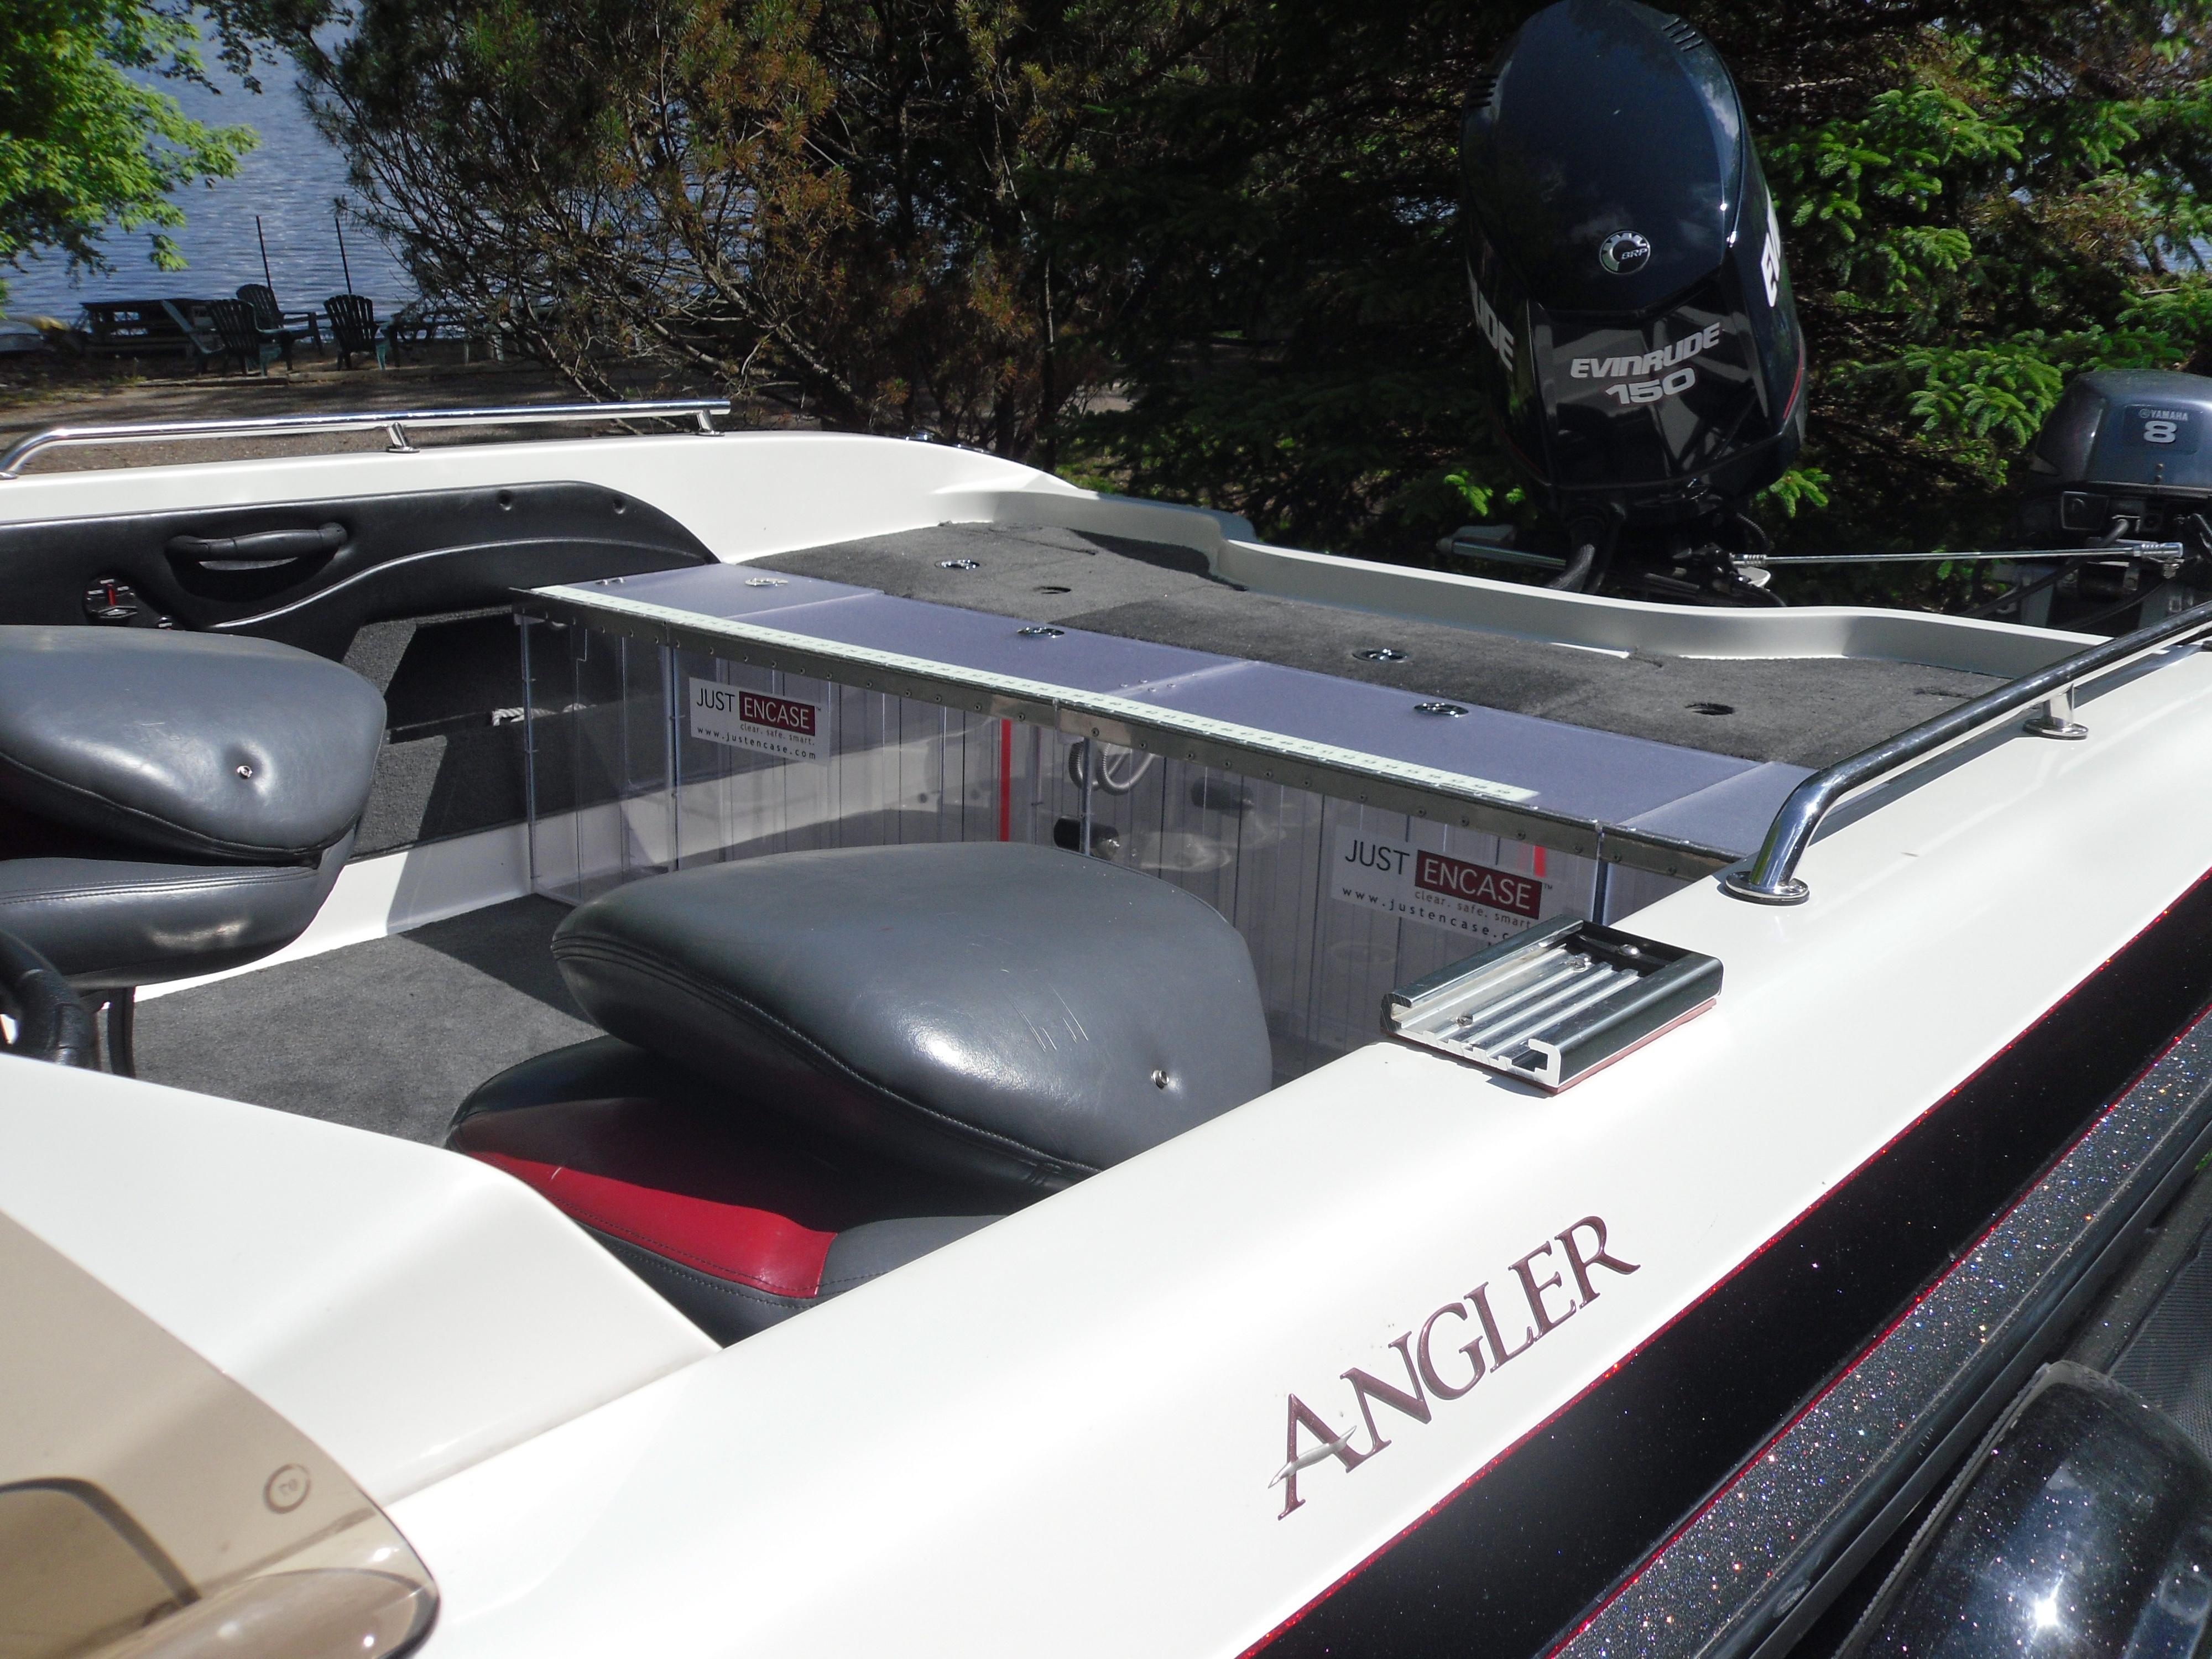 2008 Ranger Angler 1860 Tandem Back Deck Box 10